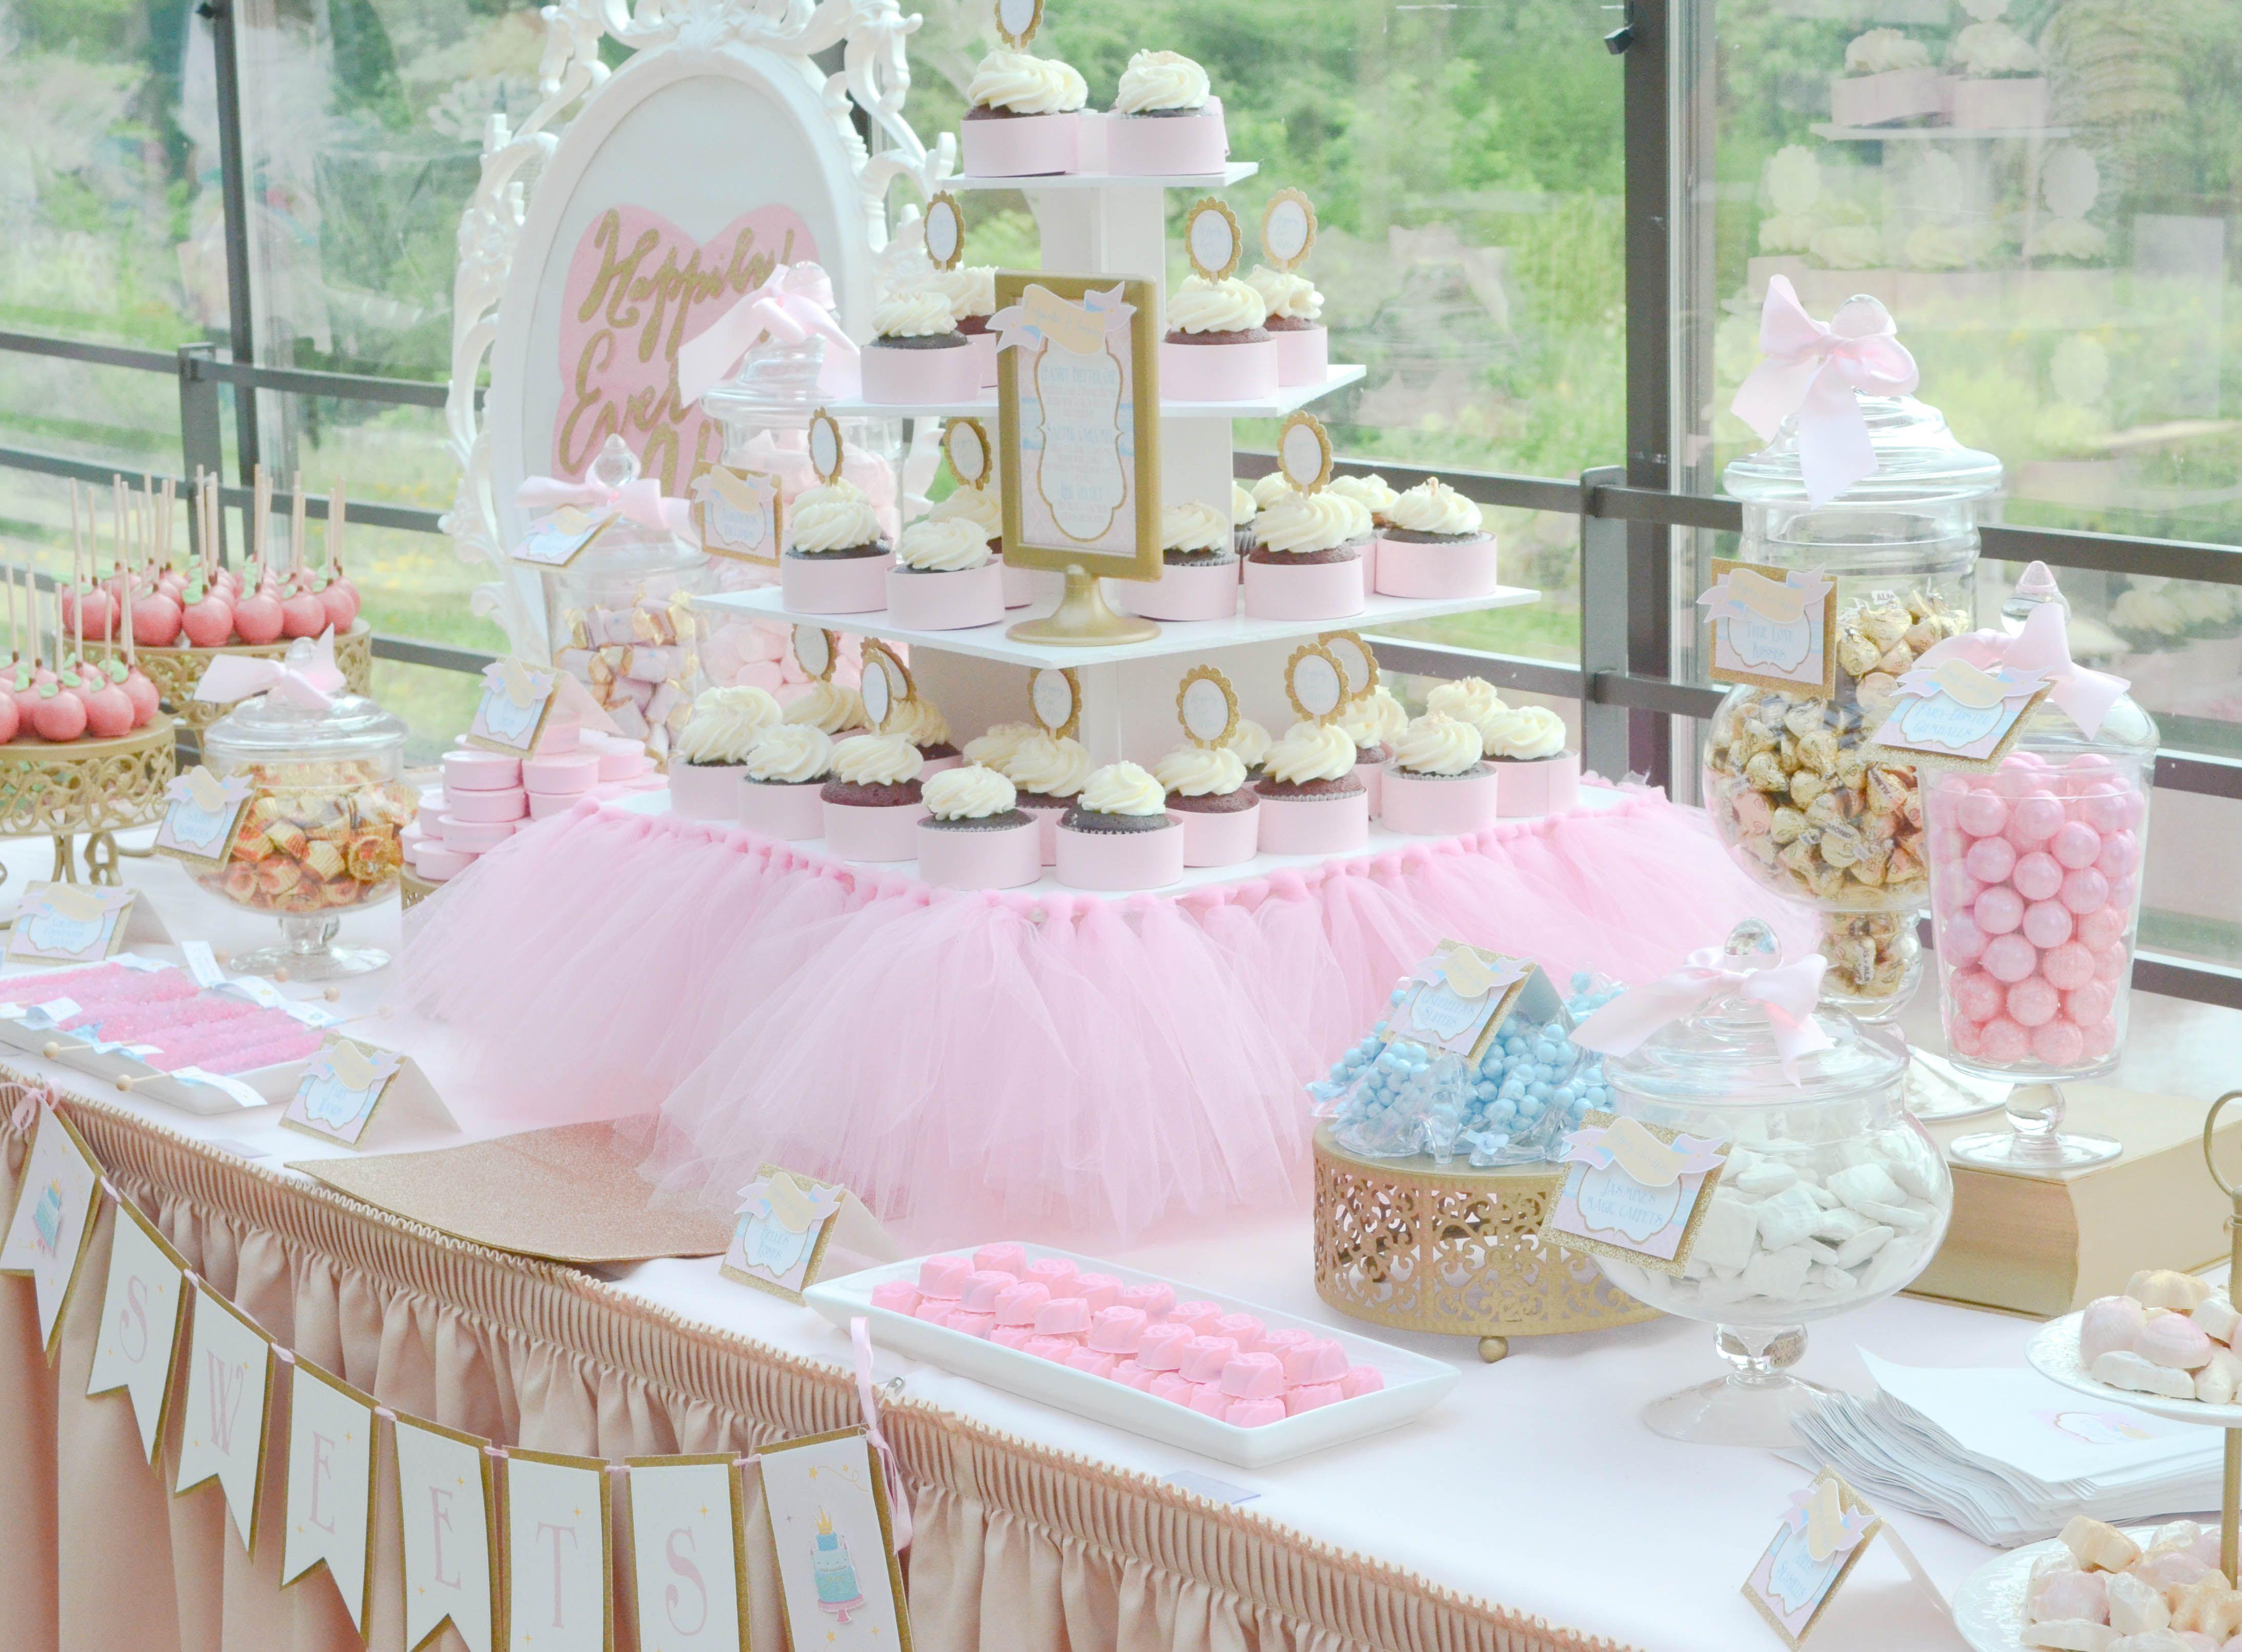 Princess Dessert Tables Disney Princess Happily Ever After Bridal Shower Dess Princess Bridal Showers Bridal Shower Desserts Bridal Shower Desserts Table